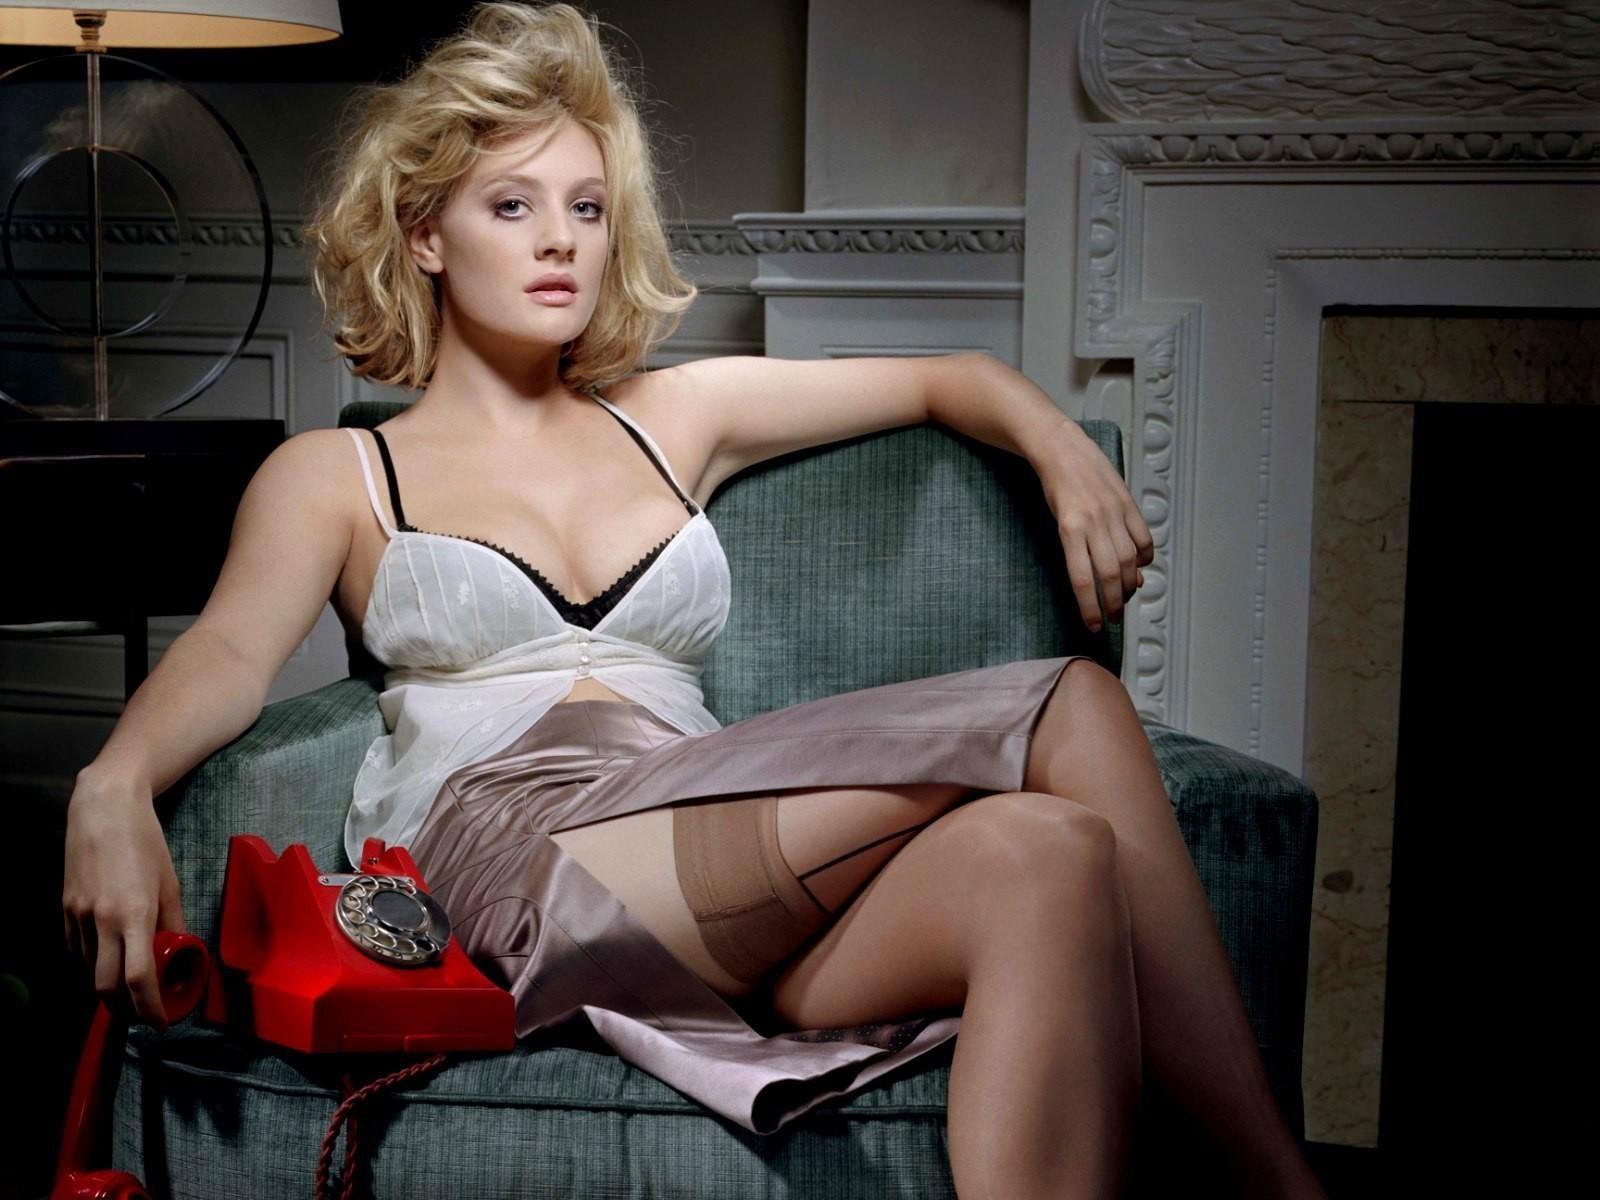 Romola Garai sexy stockings | Romola Garai | Pinterest ...